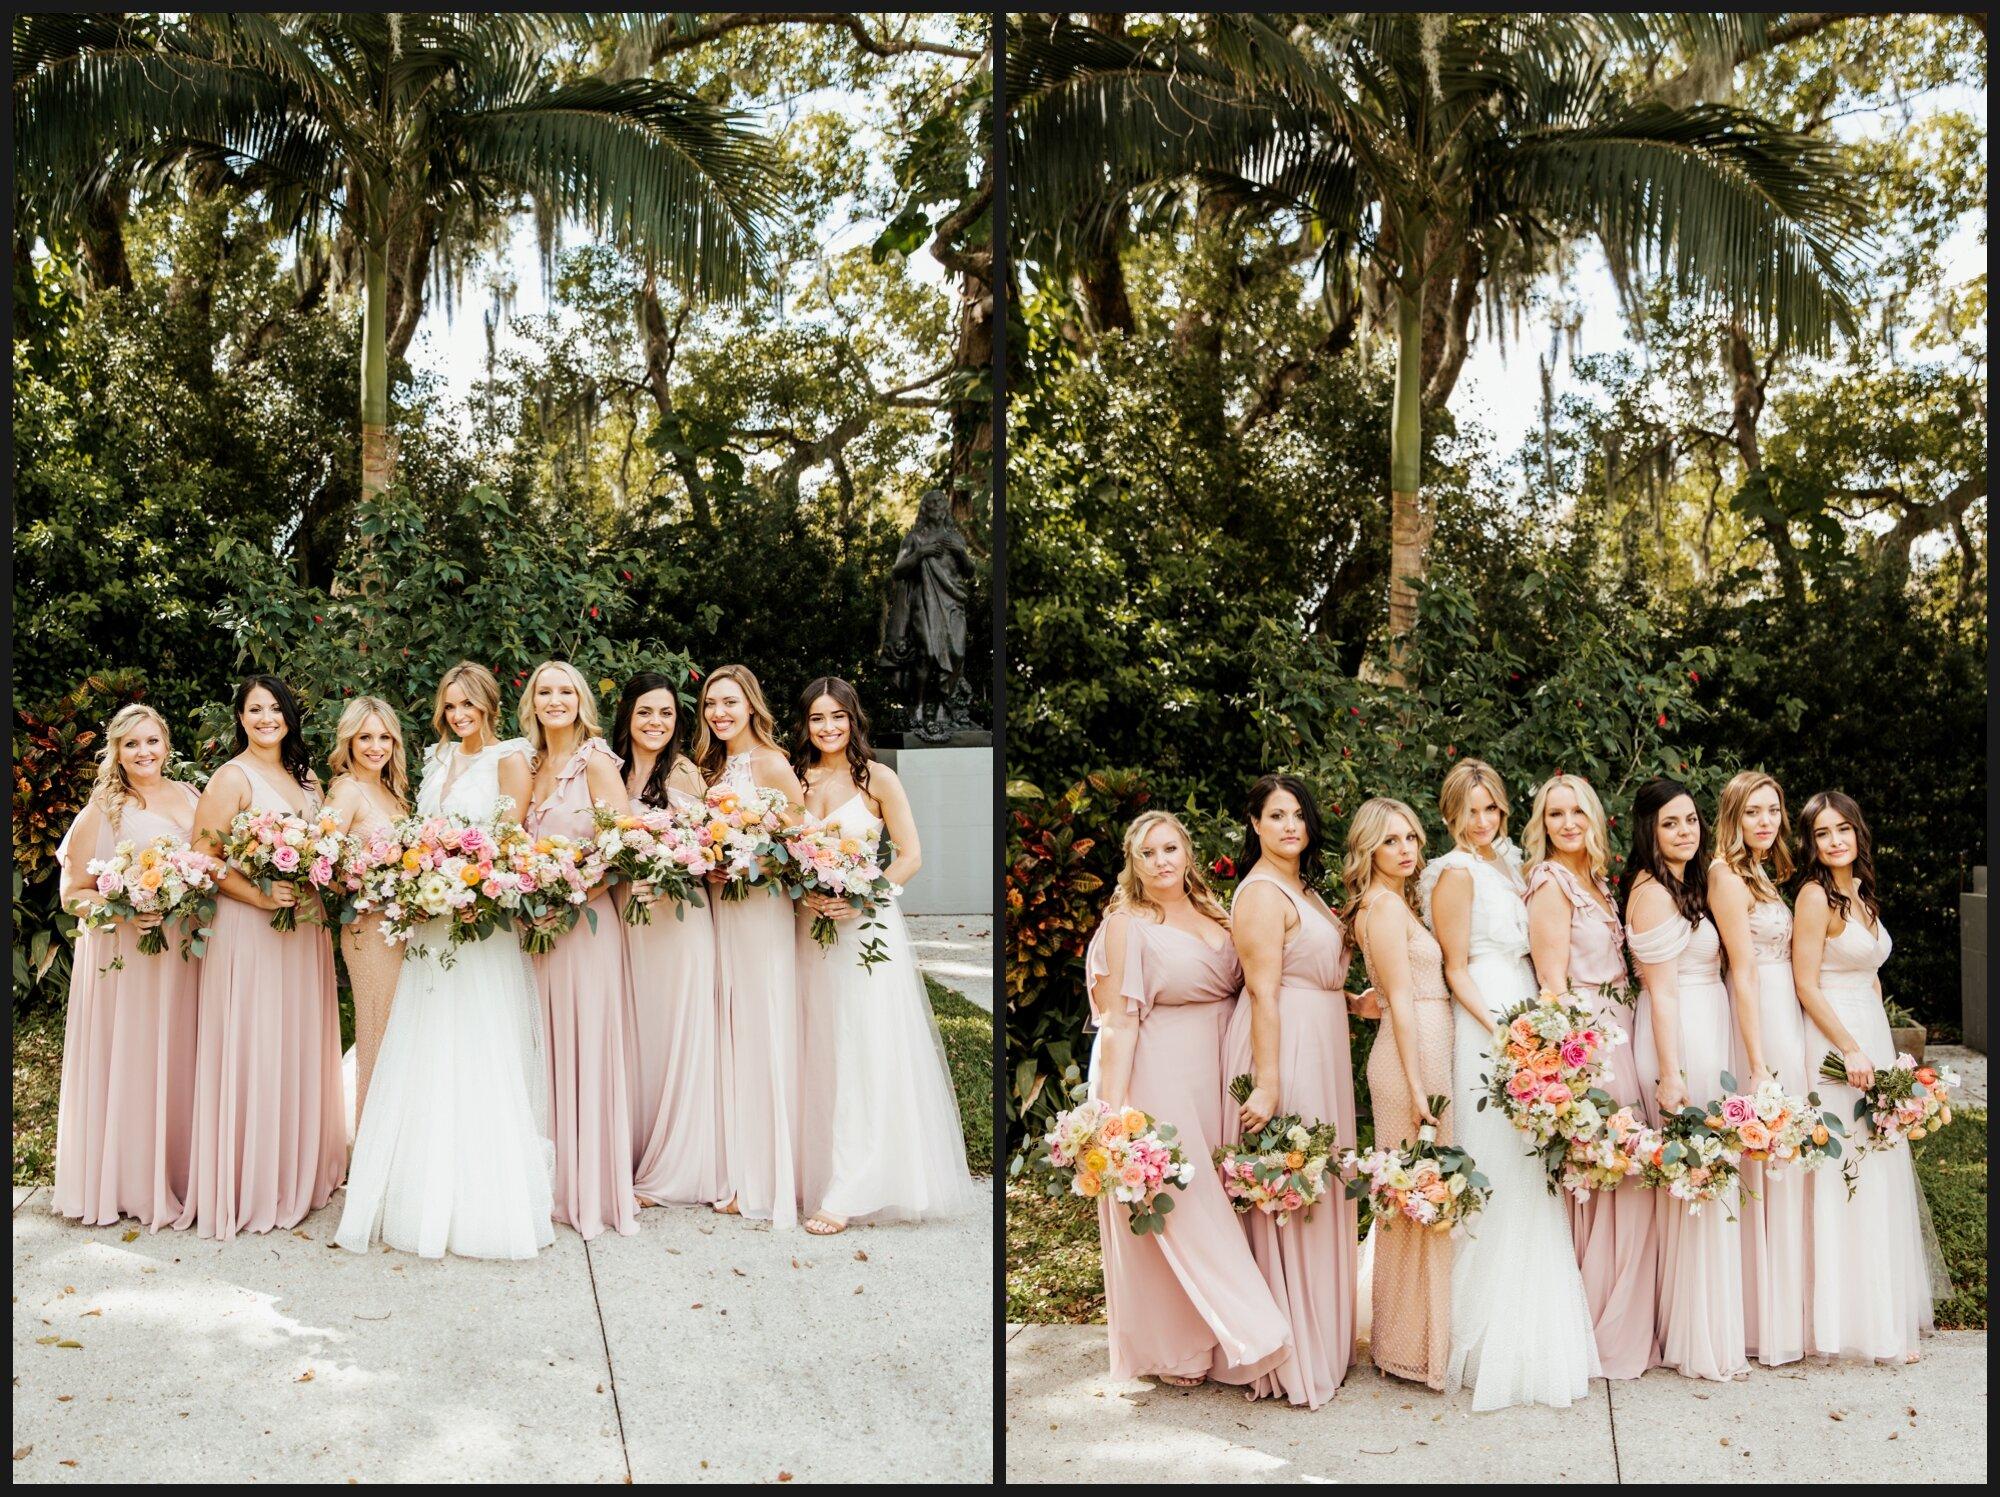 Orlando-Wedding-Photographer-destination-wedding-photographer-florida-wedding-photographer-hawaii-wedding-photographer_0705.jpg